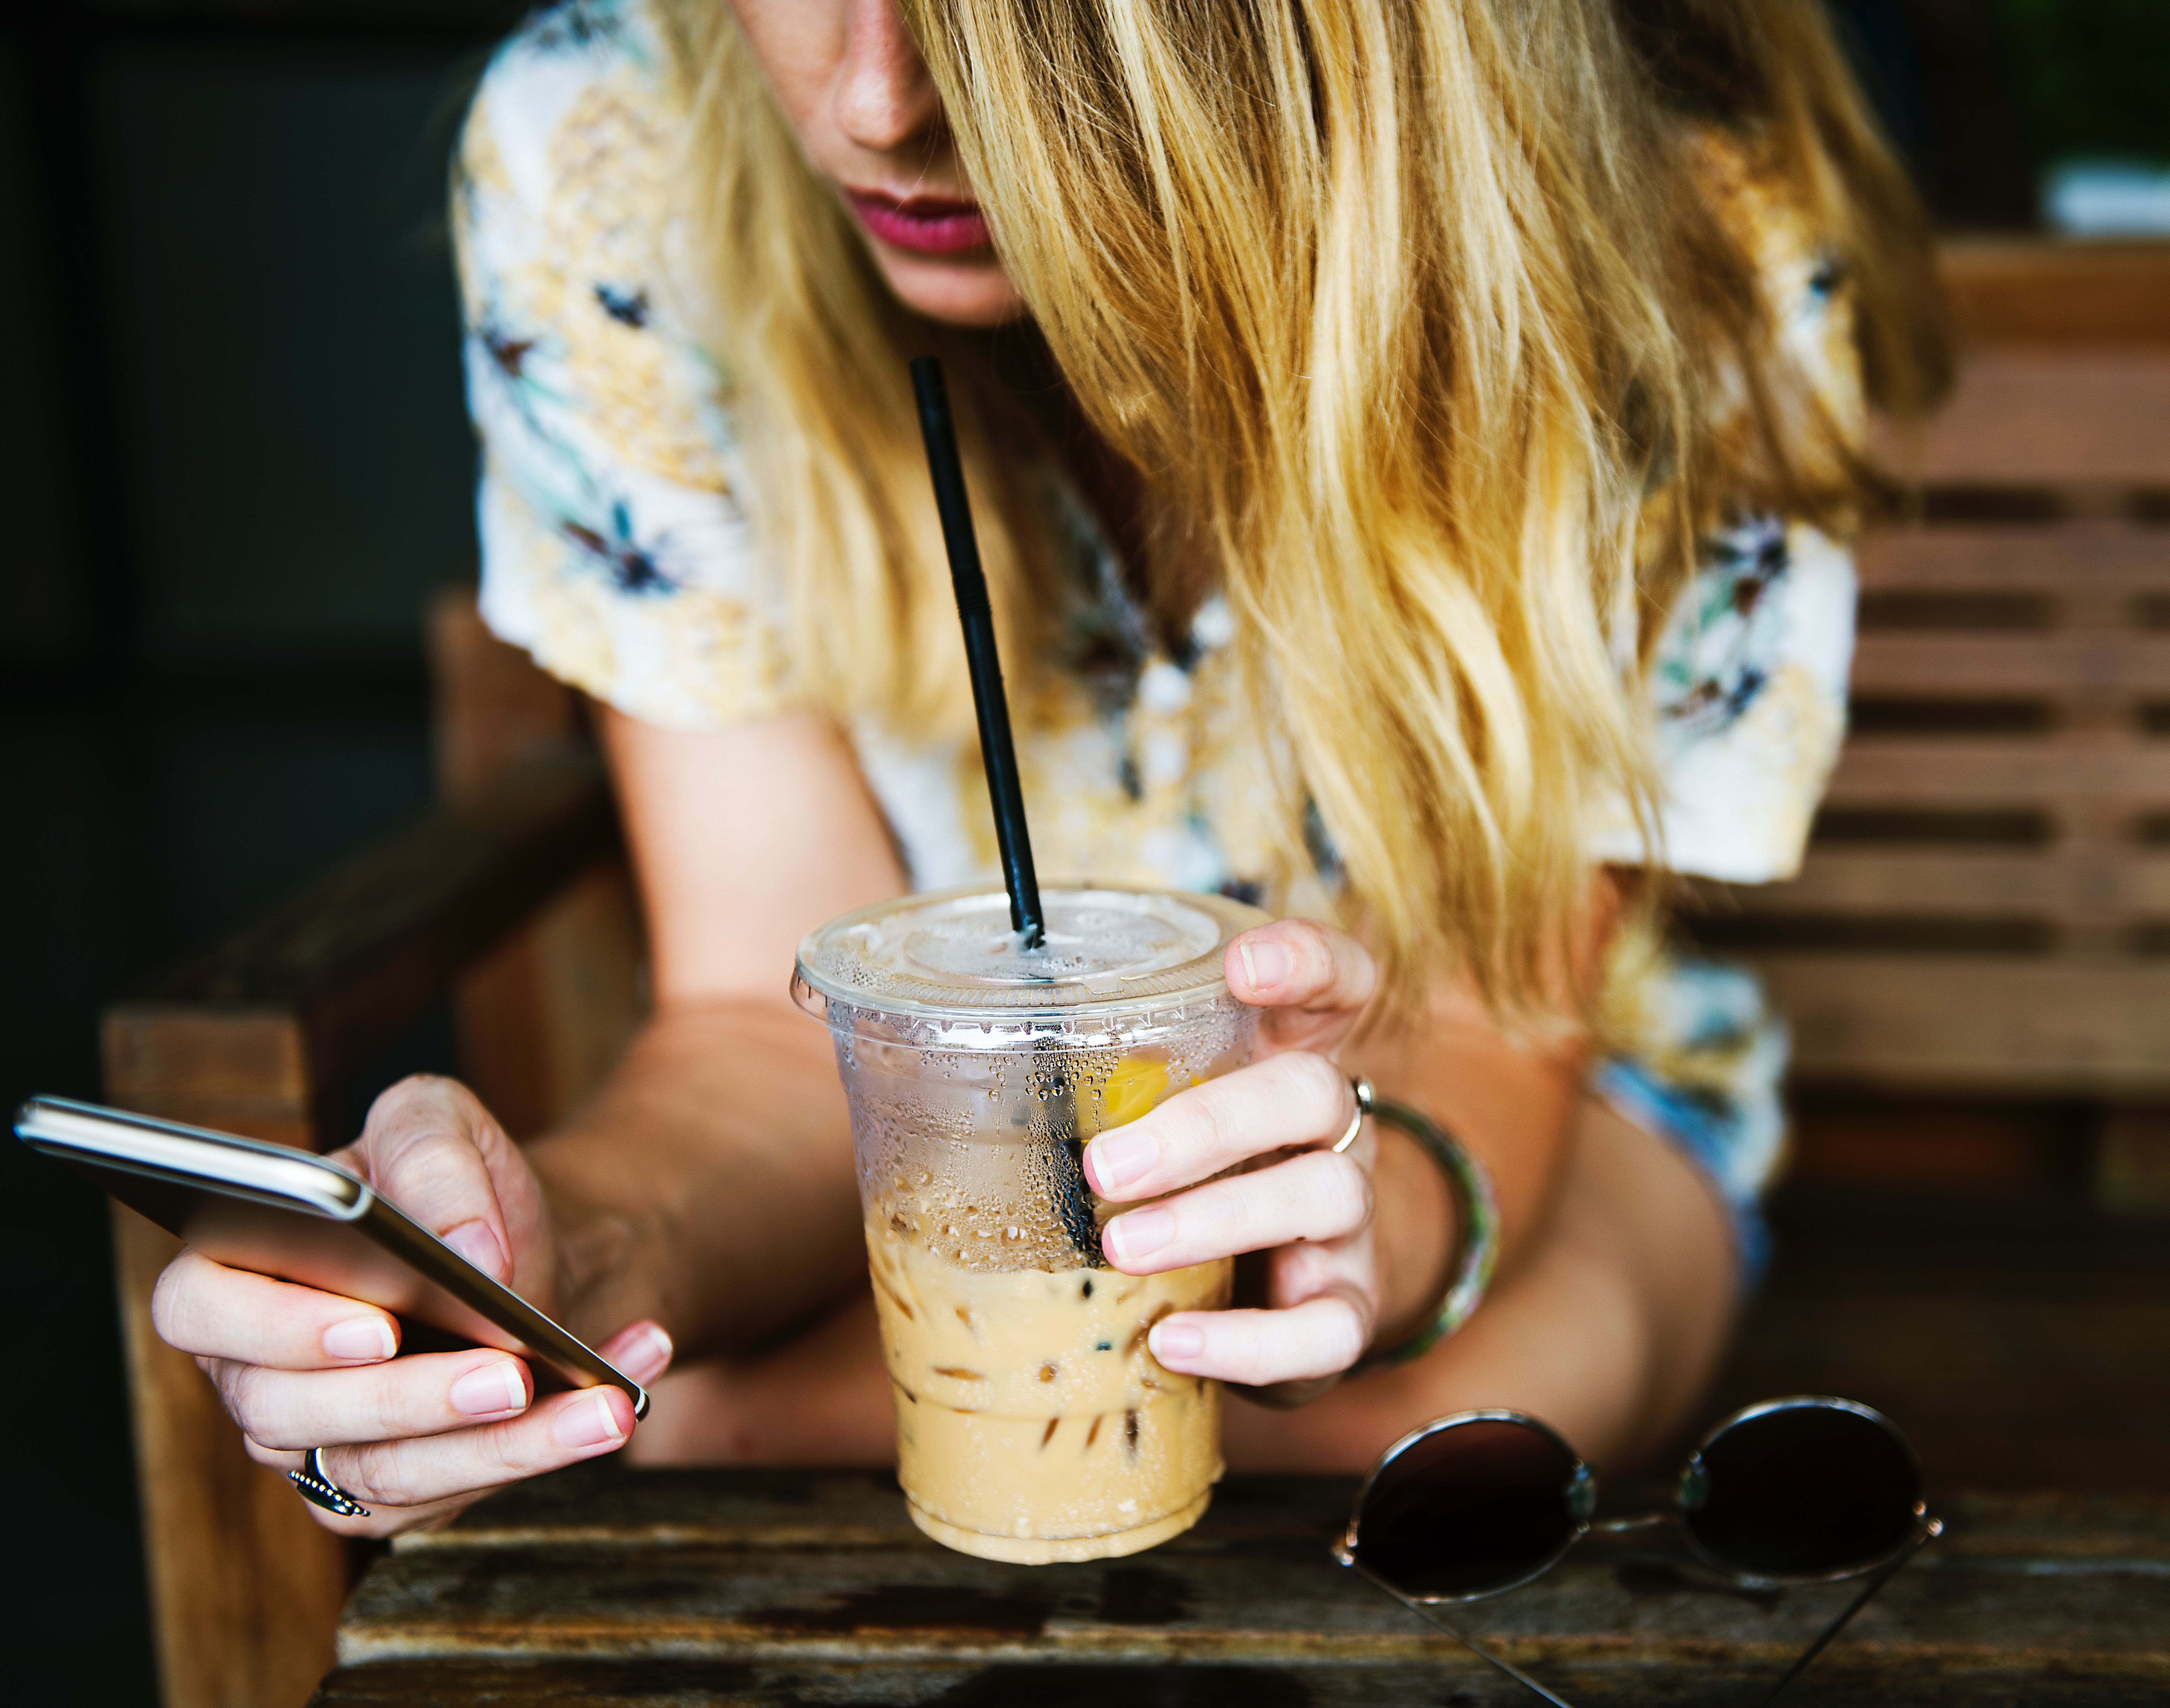 Chica mirando su móvil